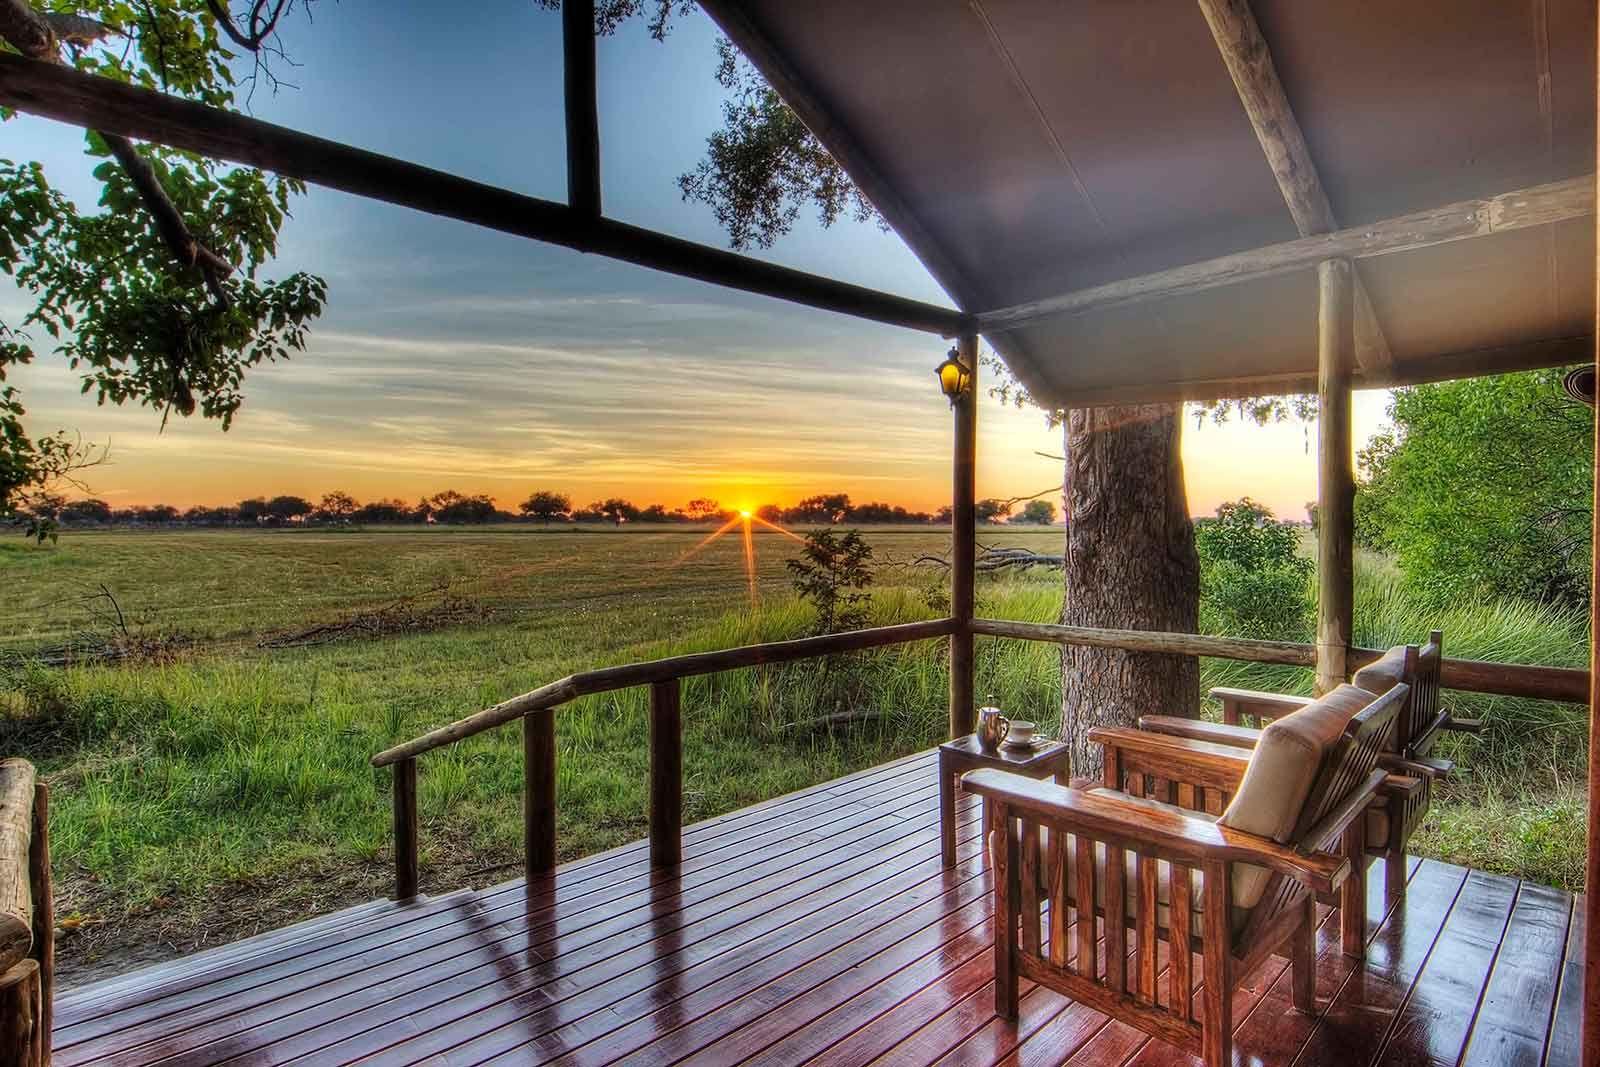 A remote Botswana Safari